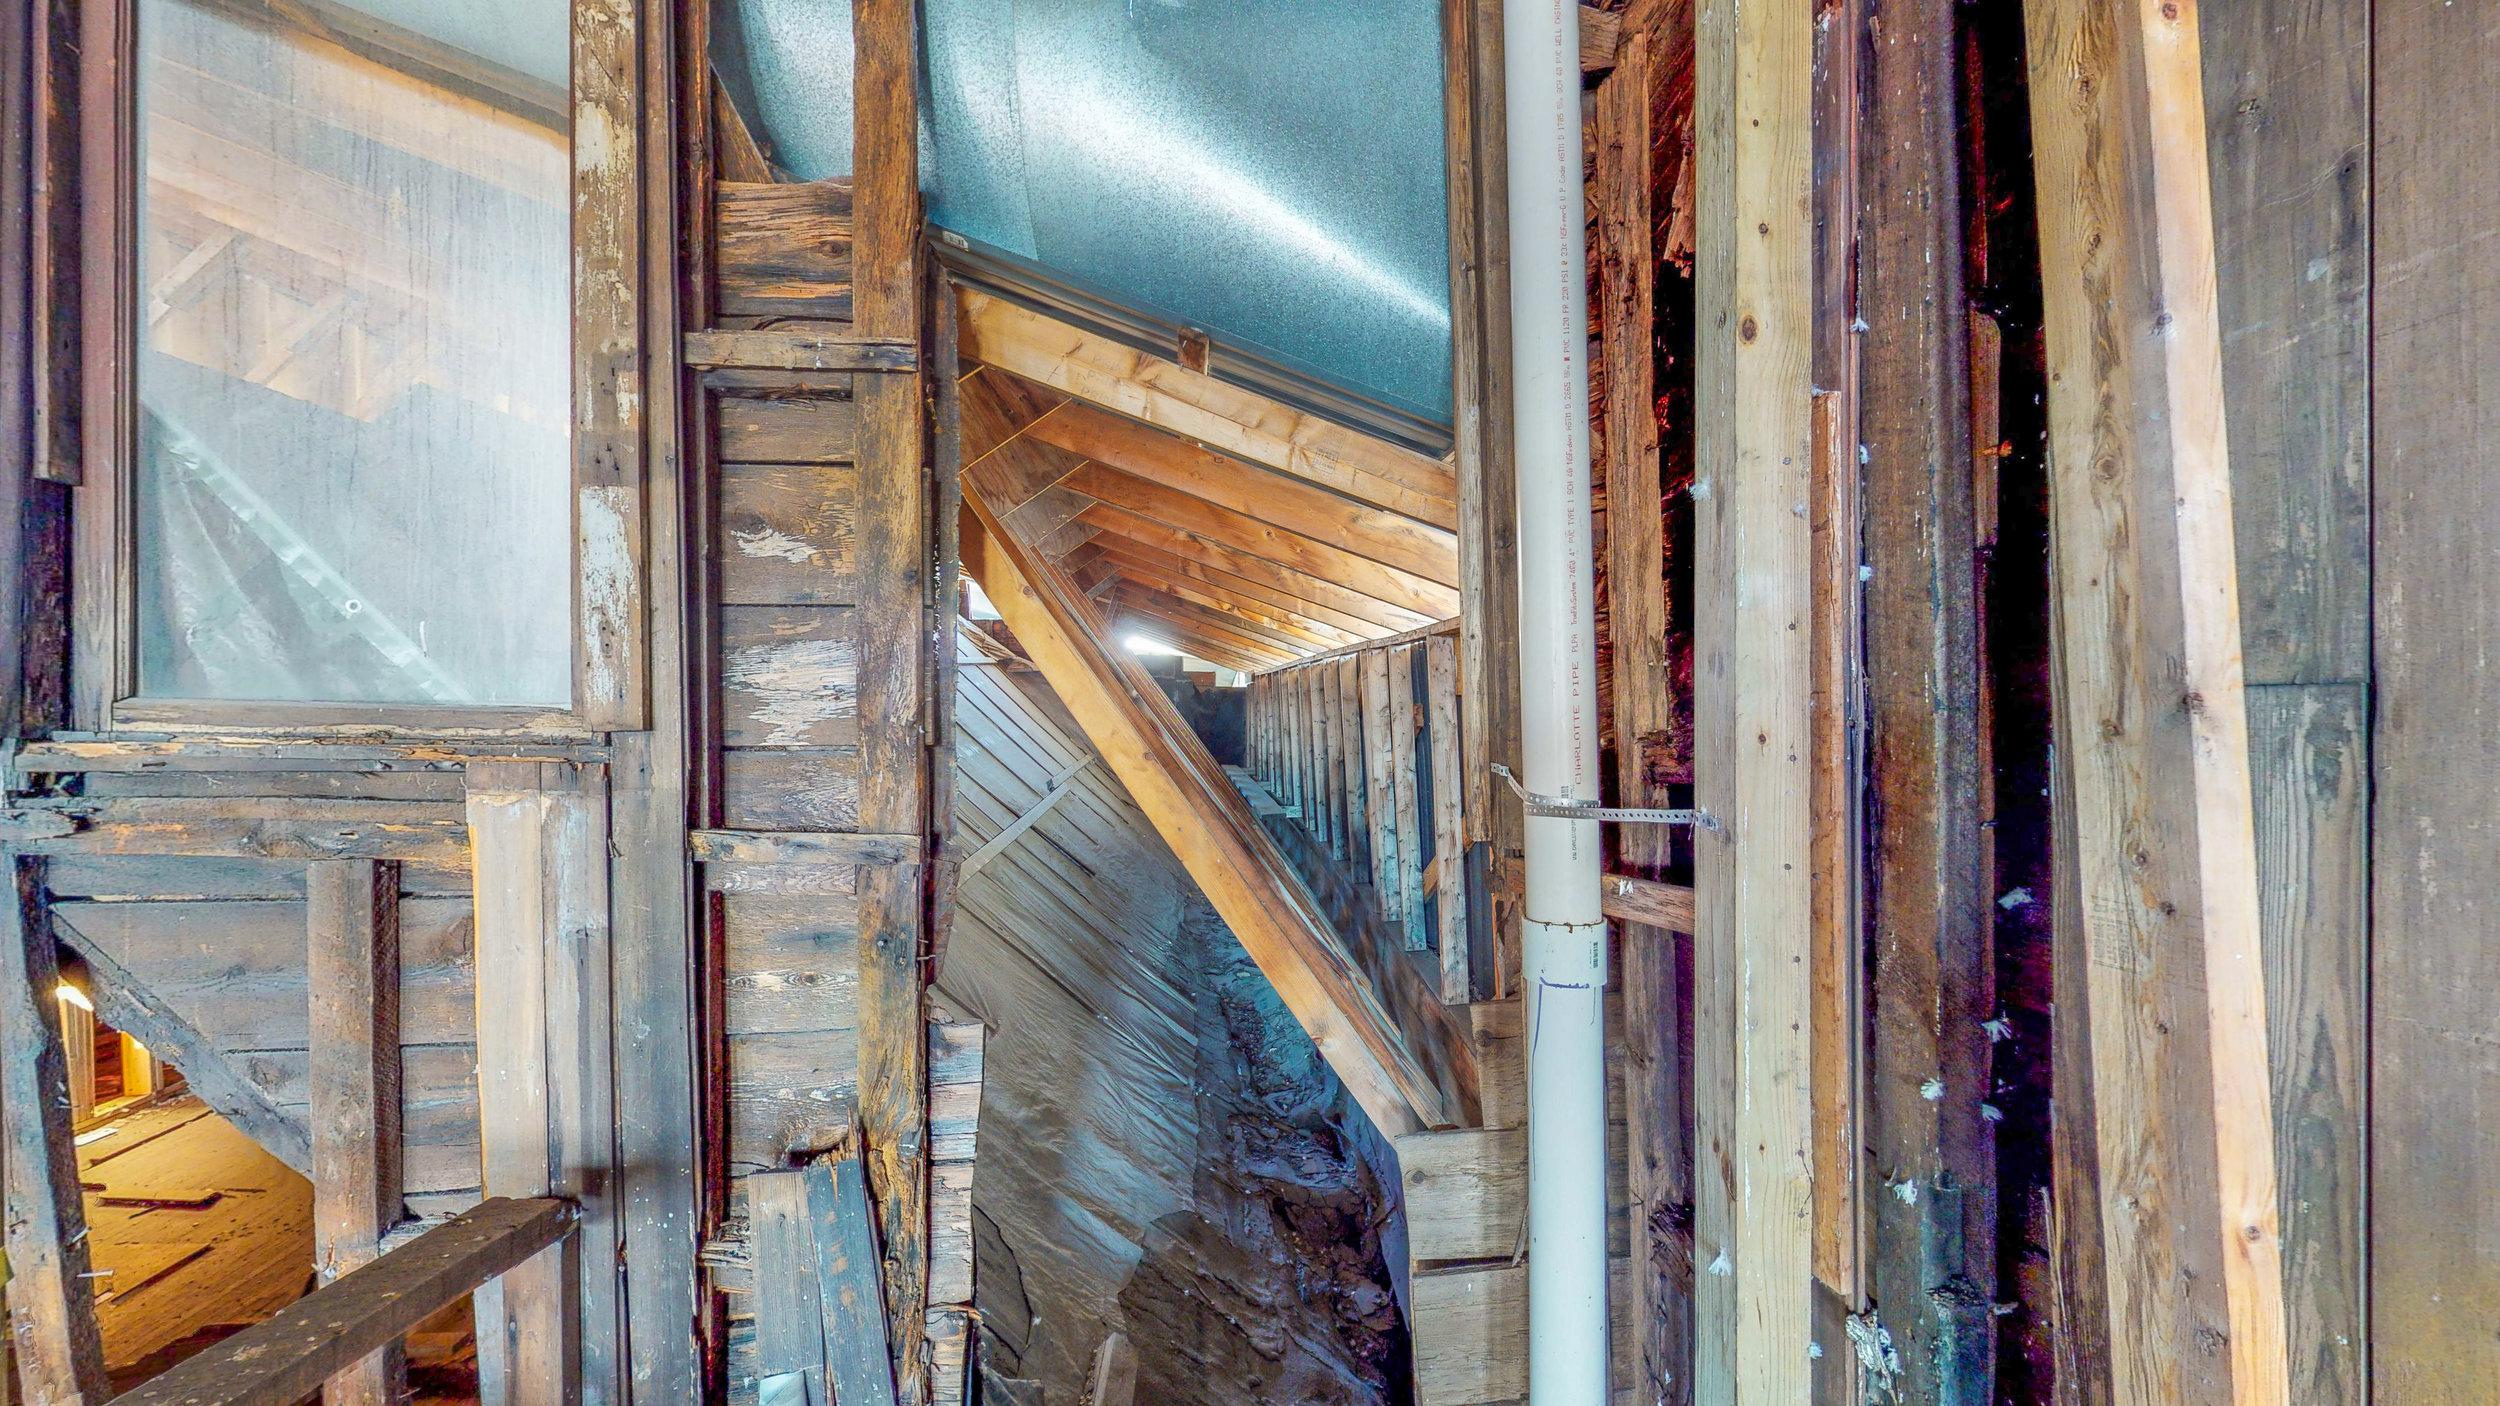 The-Van-Ostrande-Radliff-House-at-48-Hudson-08292019_131719.jpg